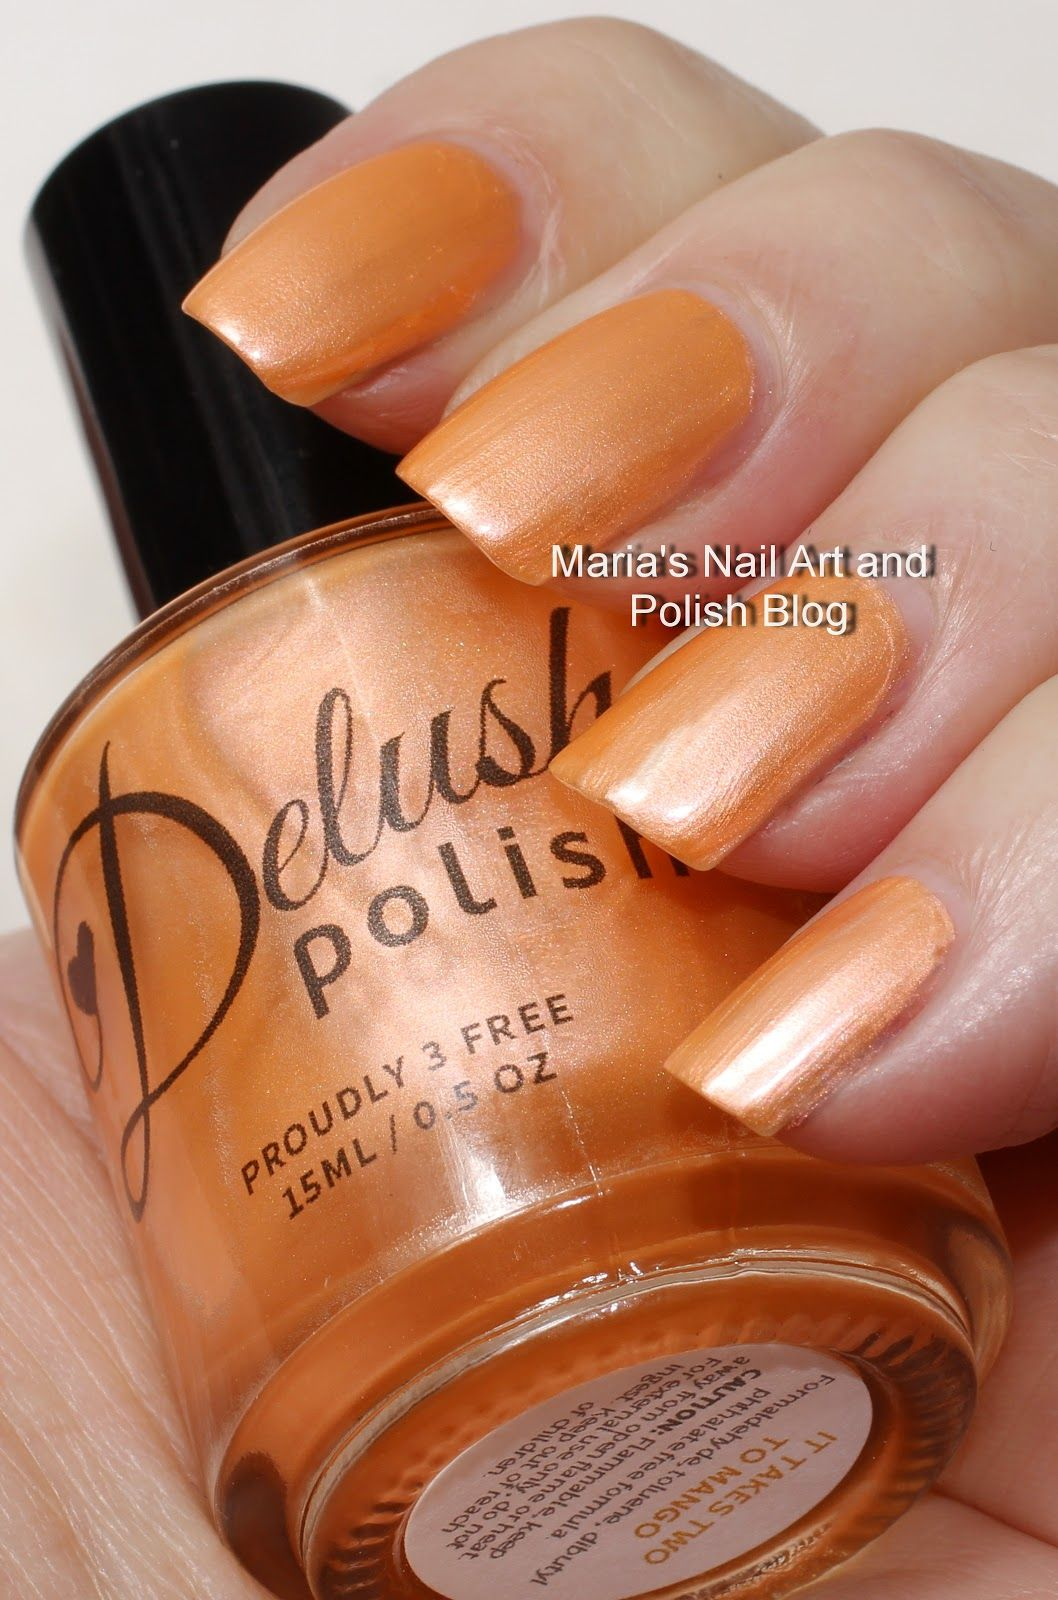 Delush swatches: It Takes Two to Mango | Nails | Pinterest | Swatch ...